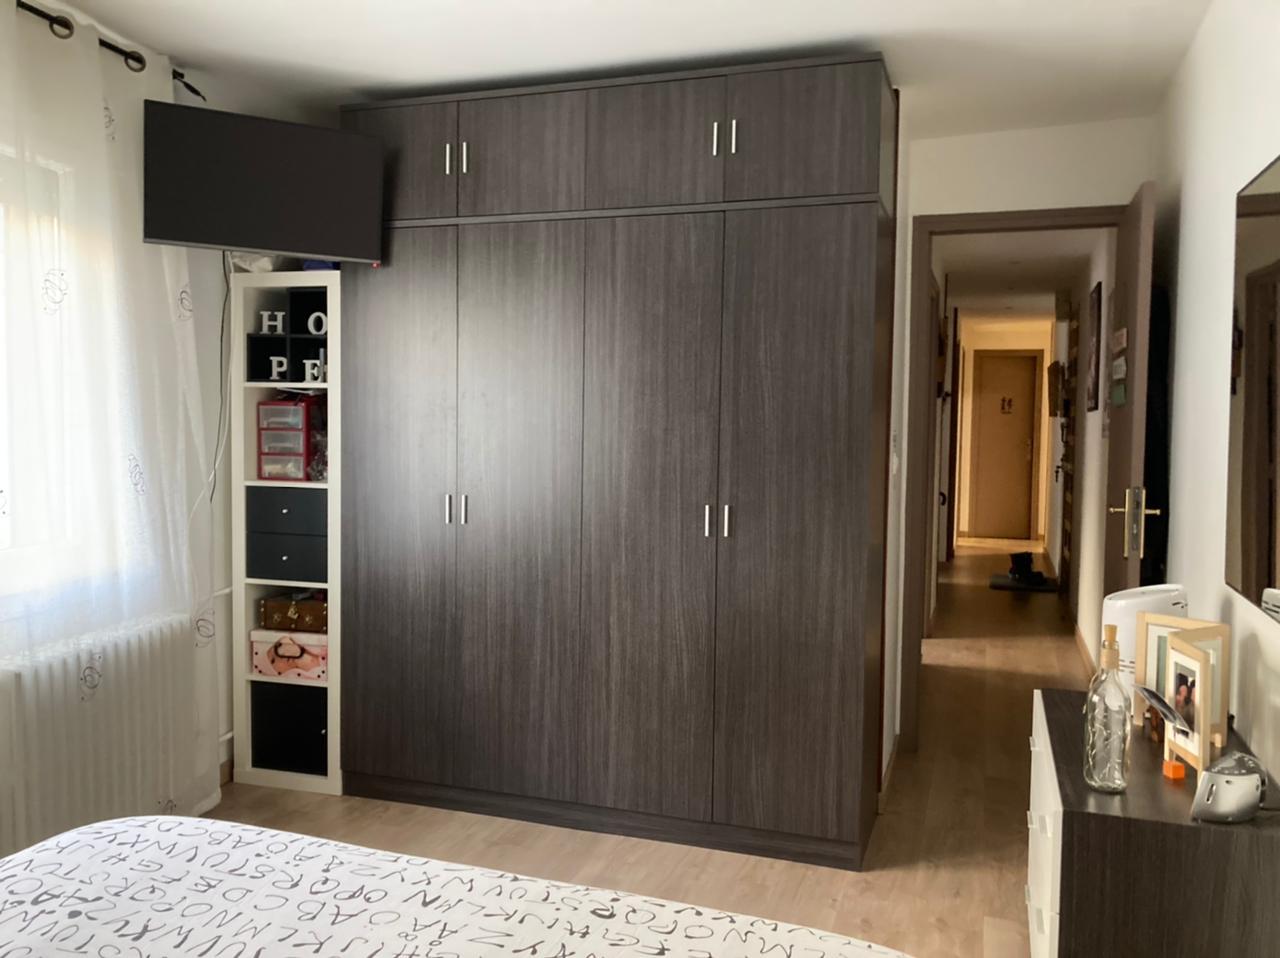 Pis en venda a Escaldes Engordany, 4 habitacions, 95 metres